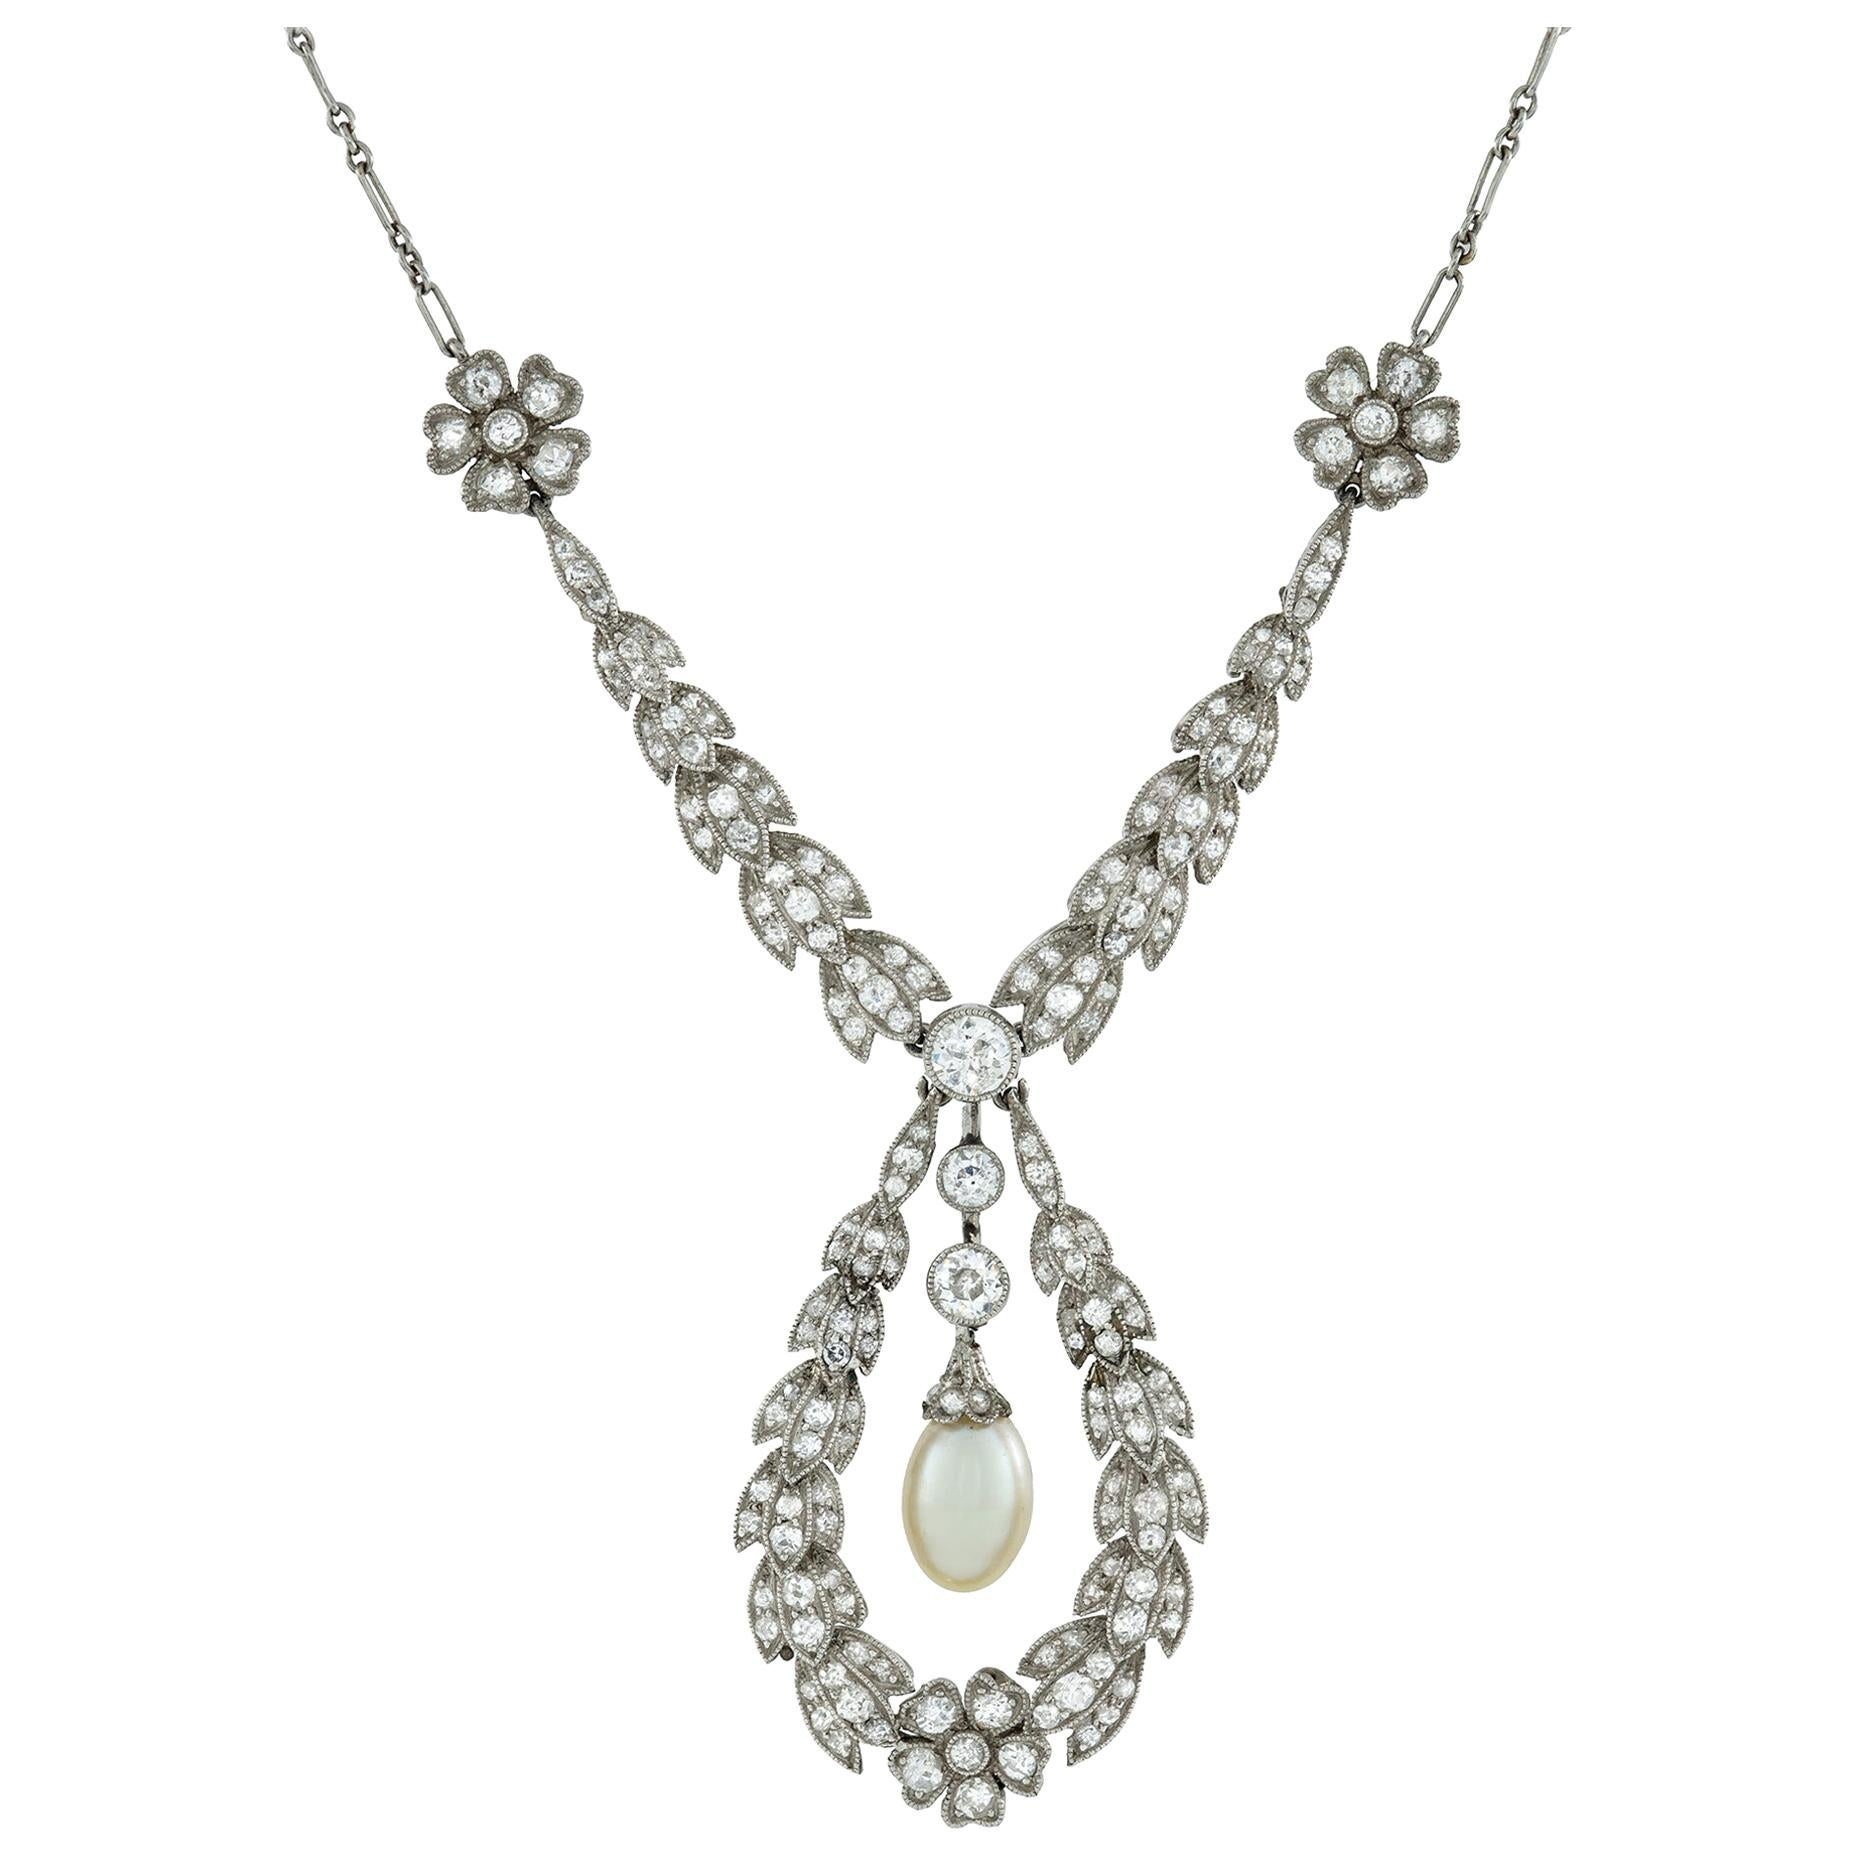 Edwardian Diamond Laurel Necklace with Pearl Drop